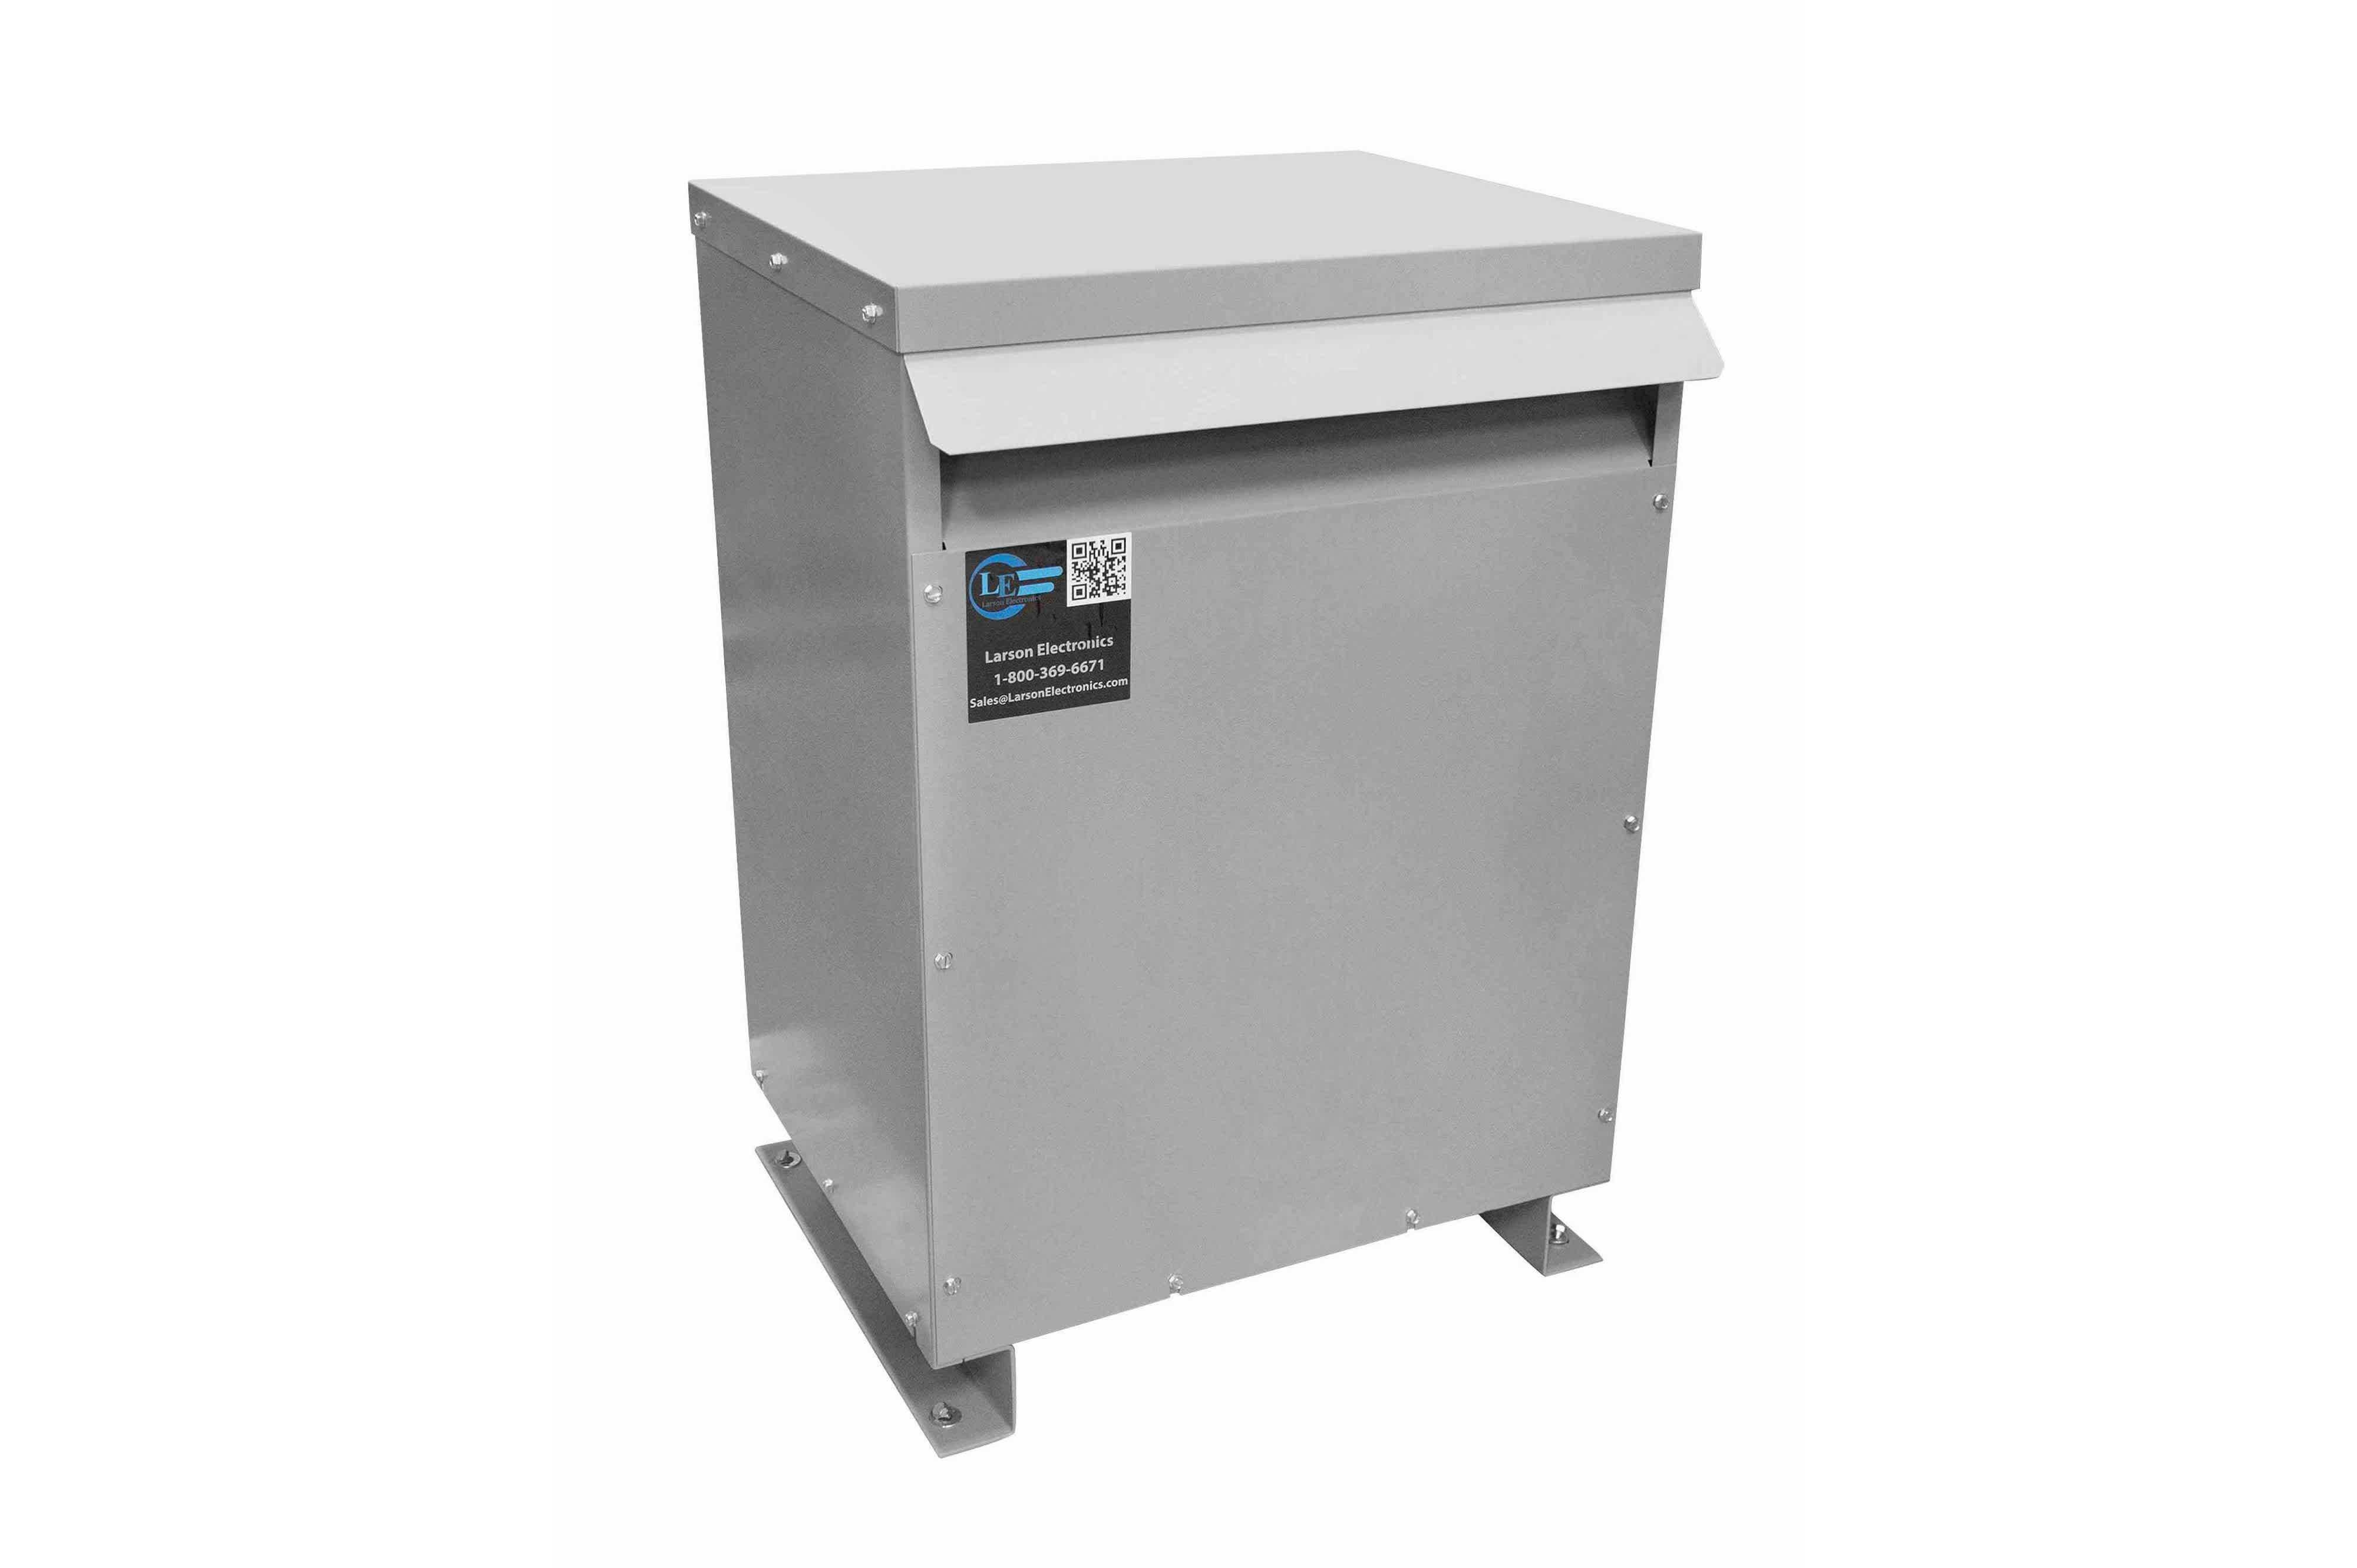 300 kVA 3PH Isolation Transformer, 440V Wye Primary, 240V Delta Secondary, N3R, Ventilated, 60 Hz